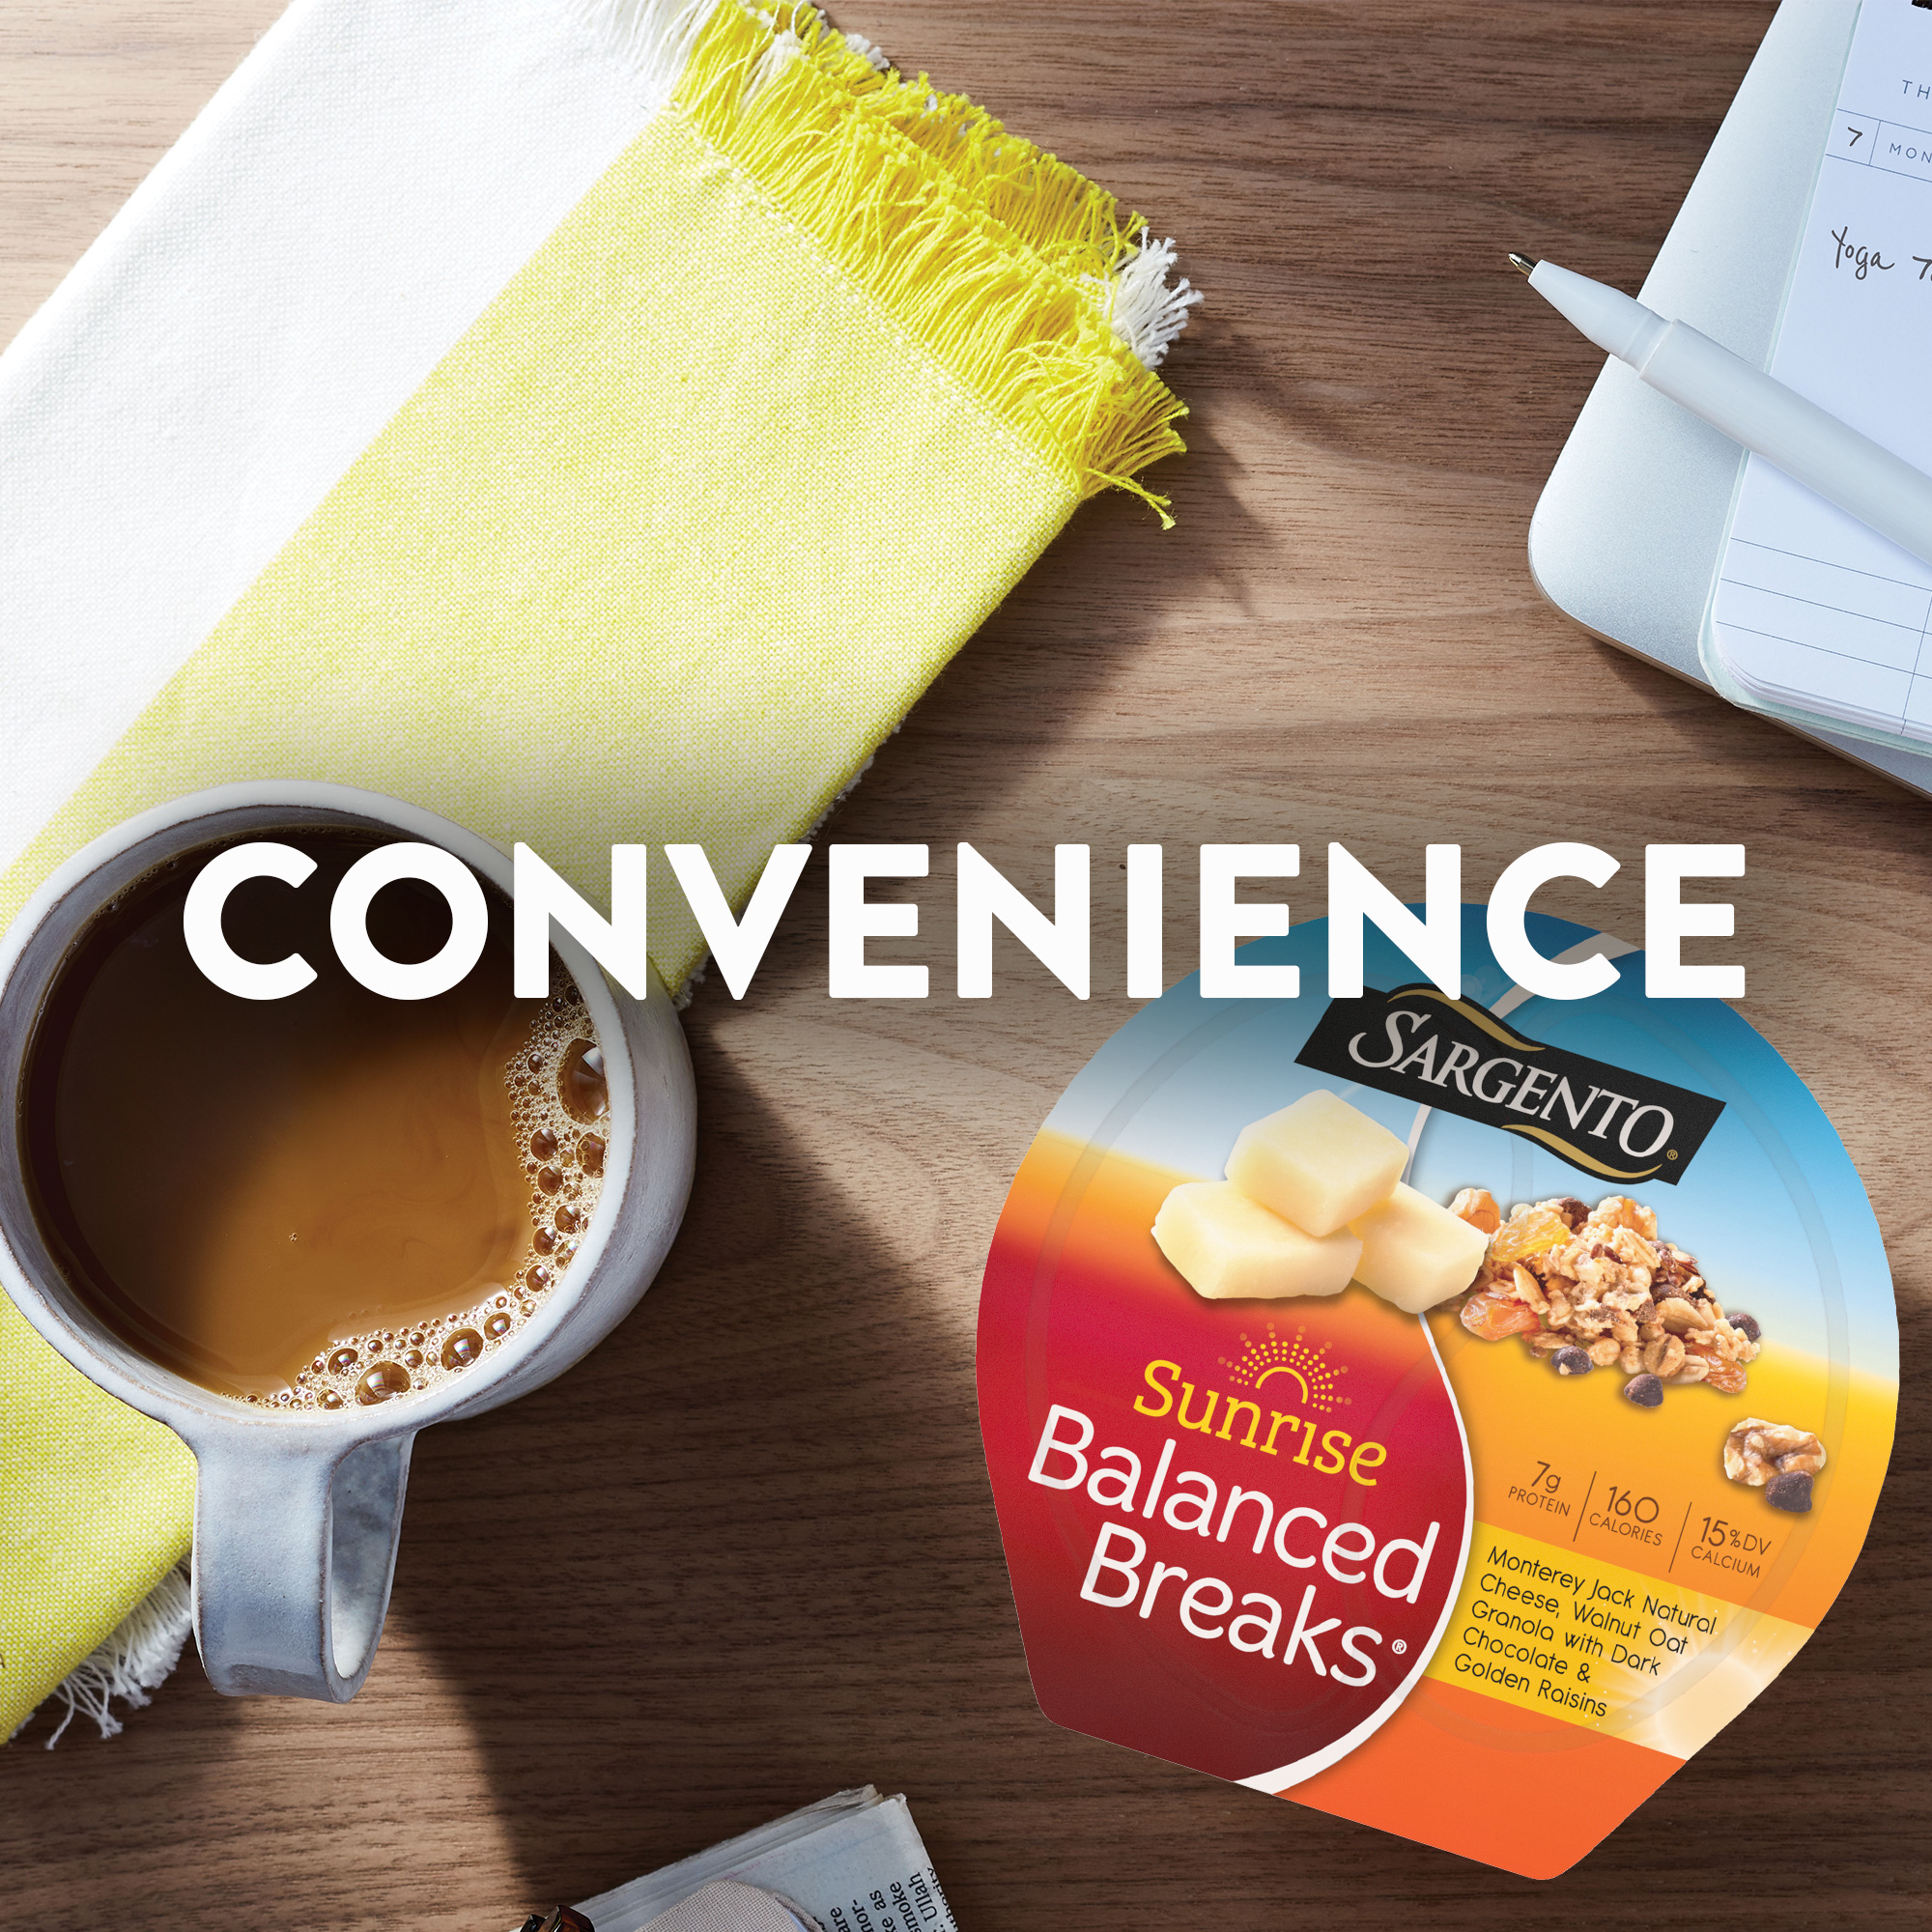 Sargento® Sunrise Balanced Breaks® Monterey Jack Natural Cheese, Walnut Oat Granola with Dark Chocolate, and Golden Raisins